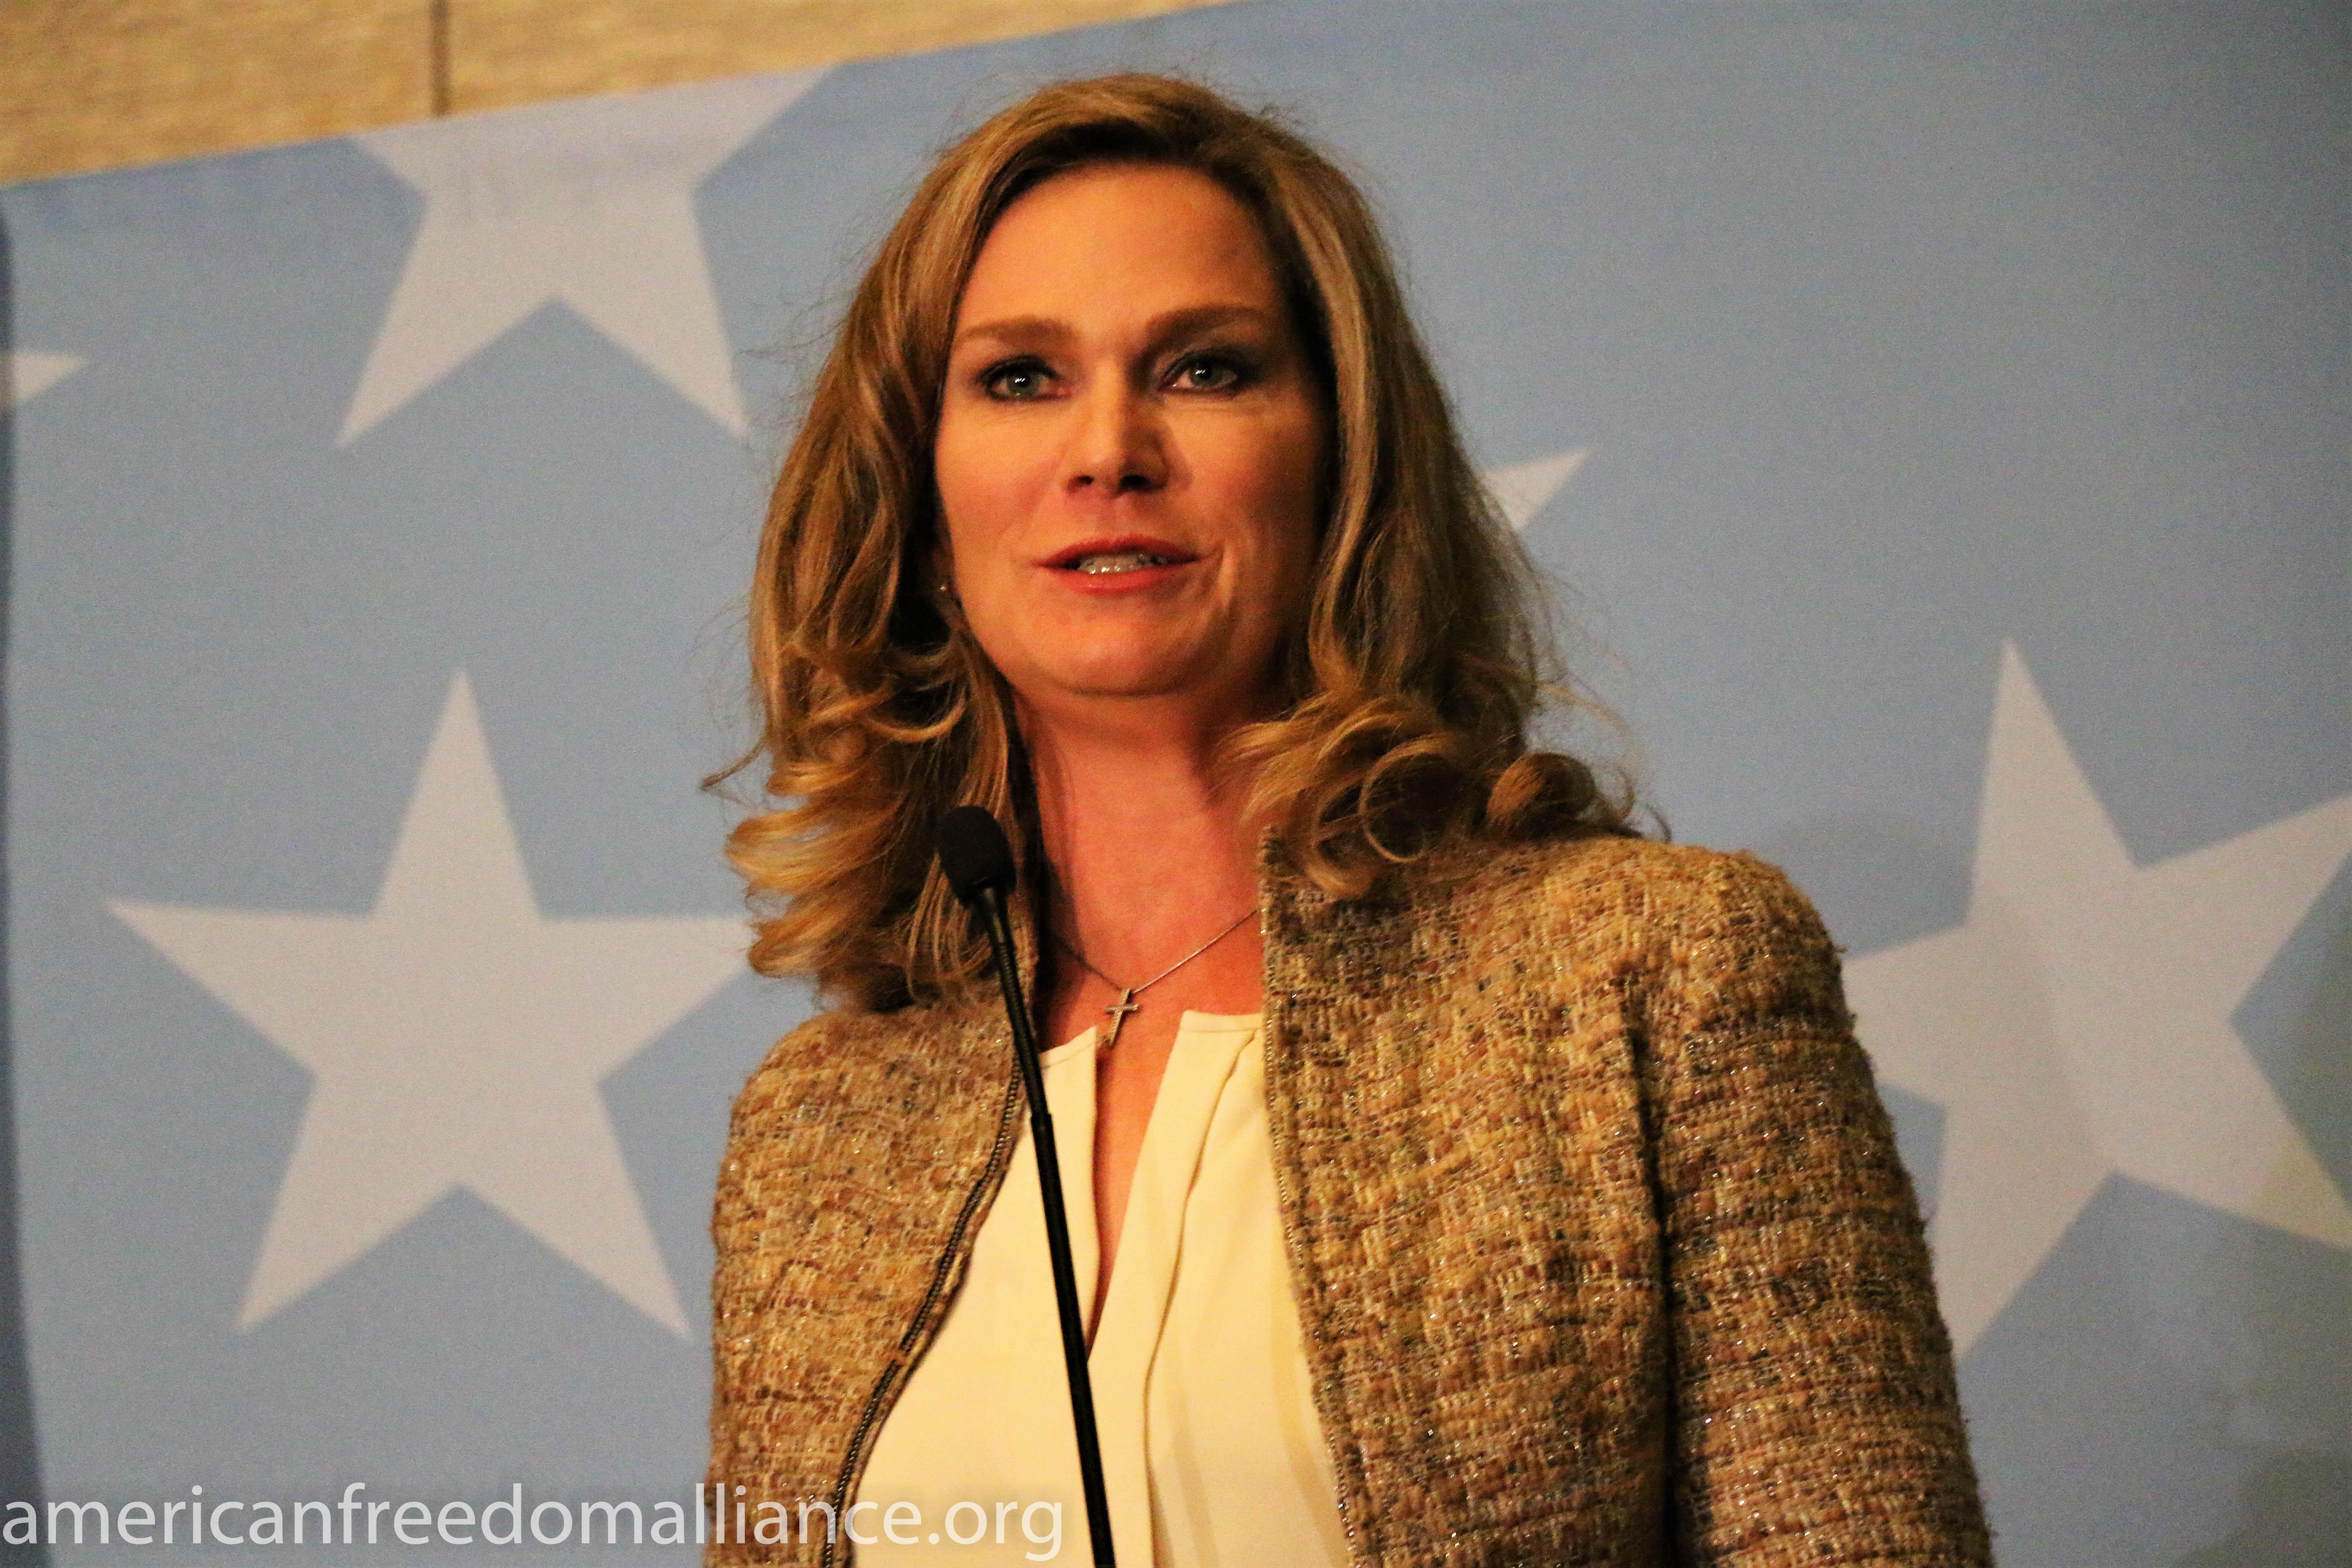 Catherine Engelbrecht at the Podium